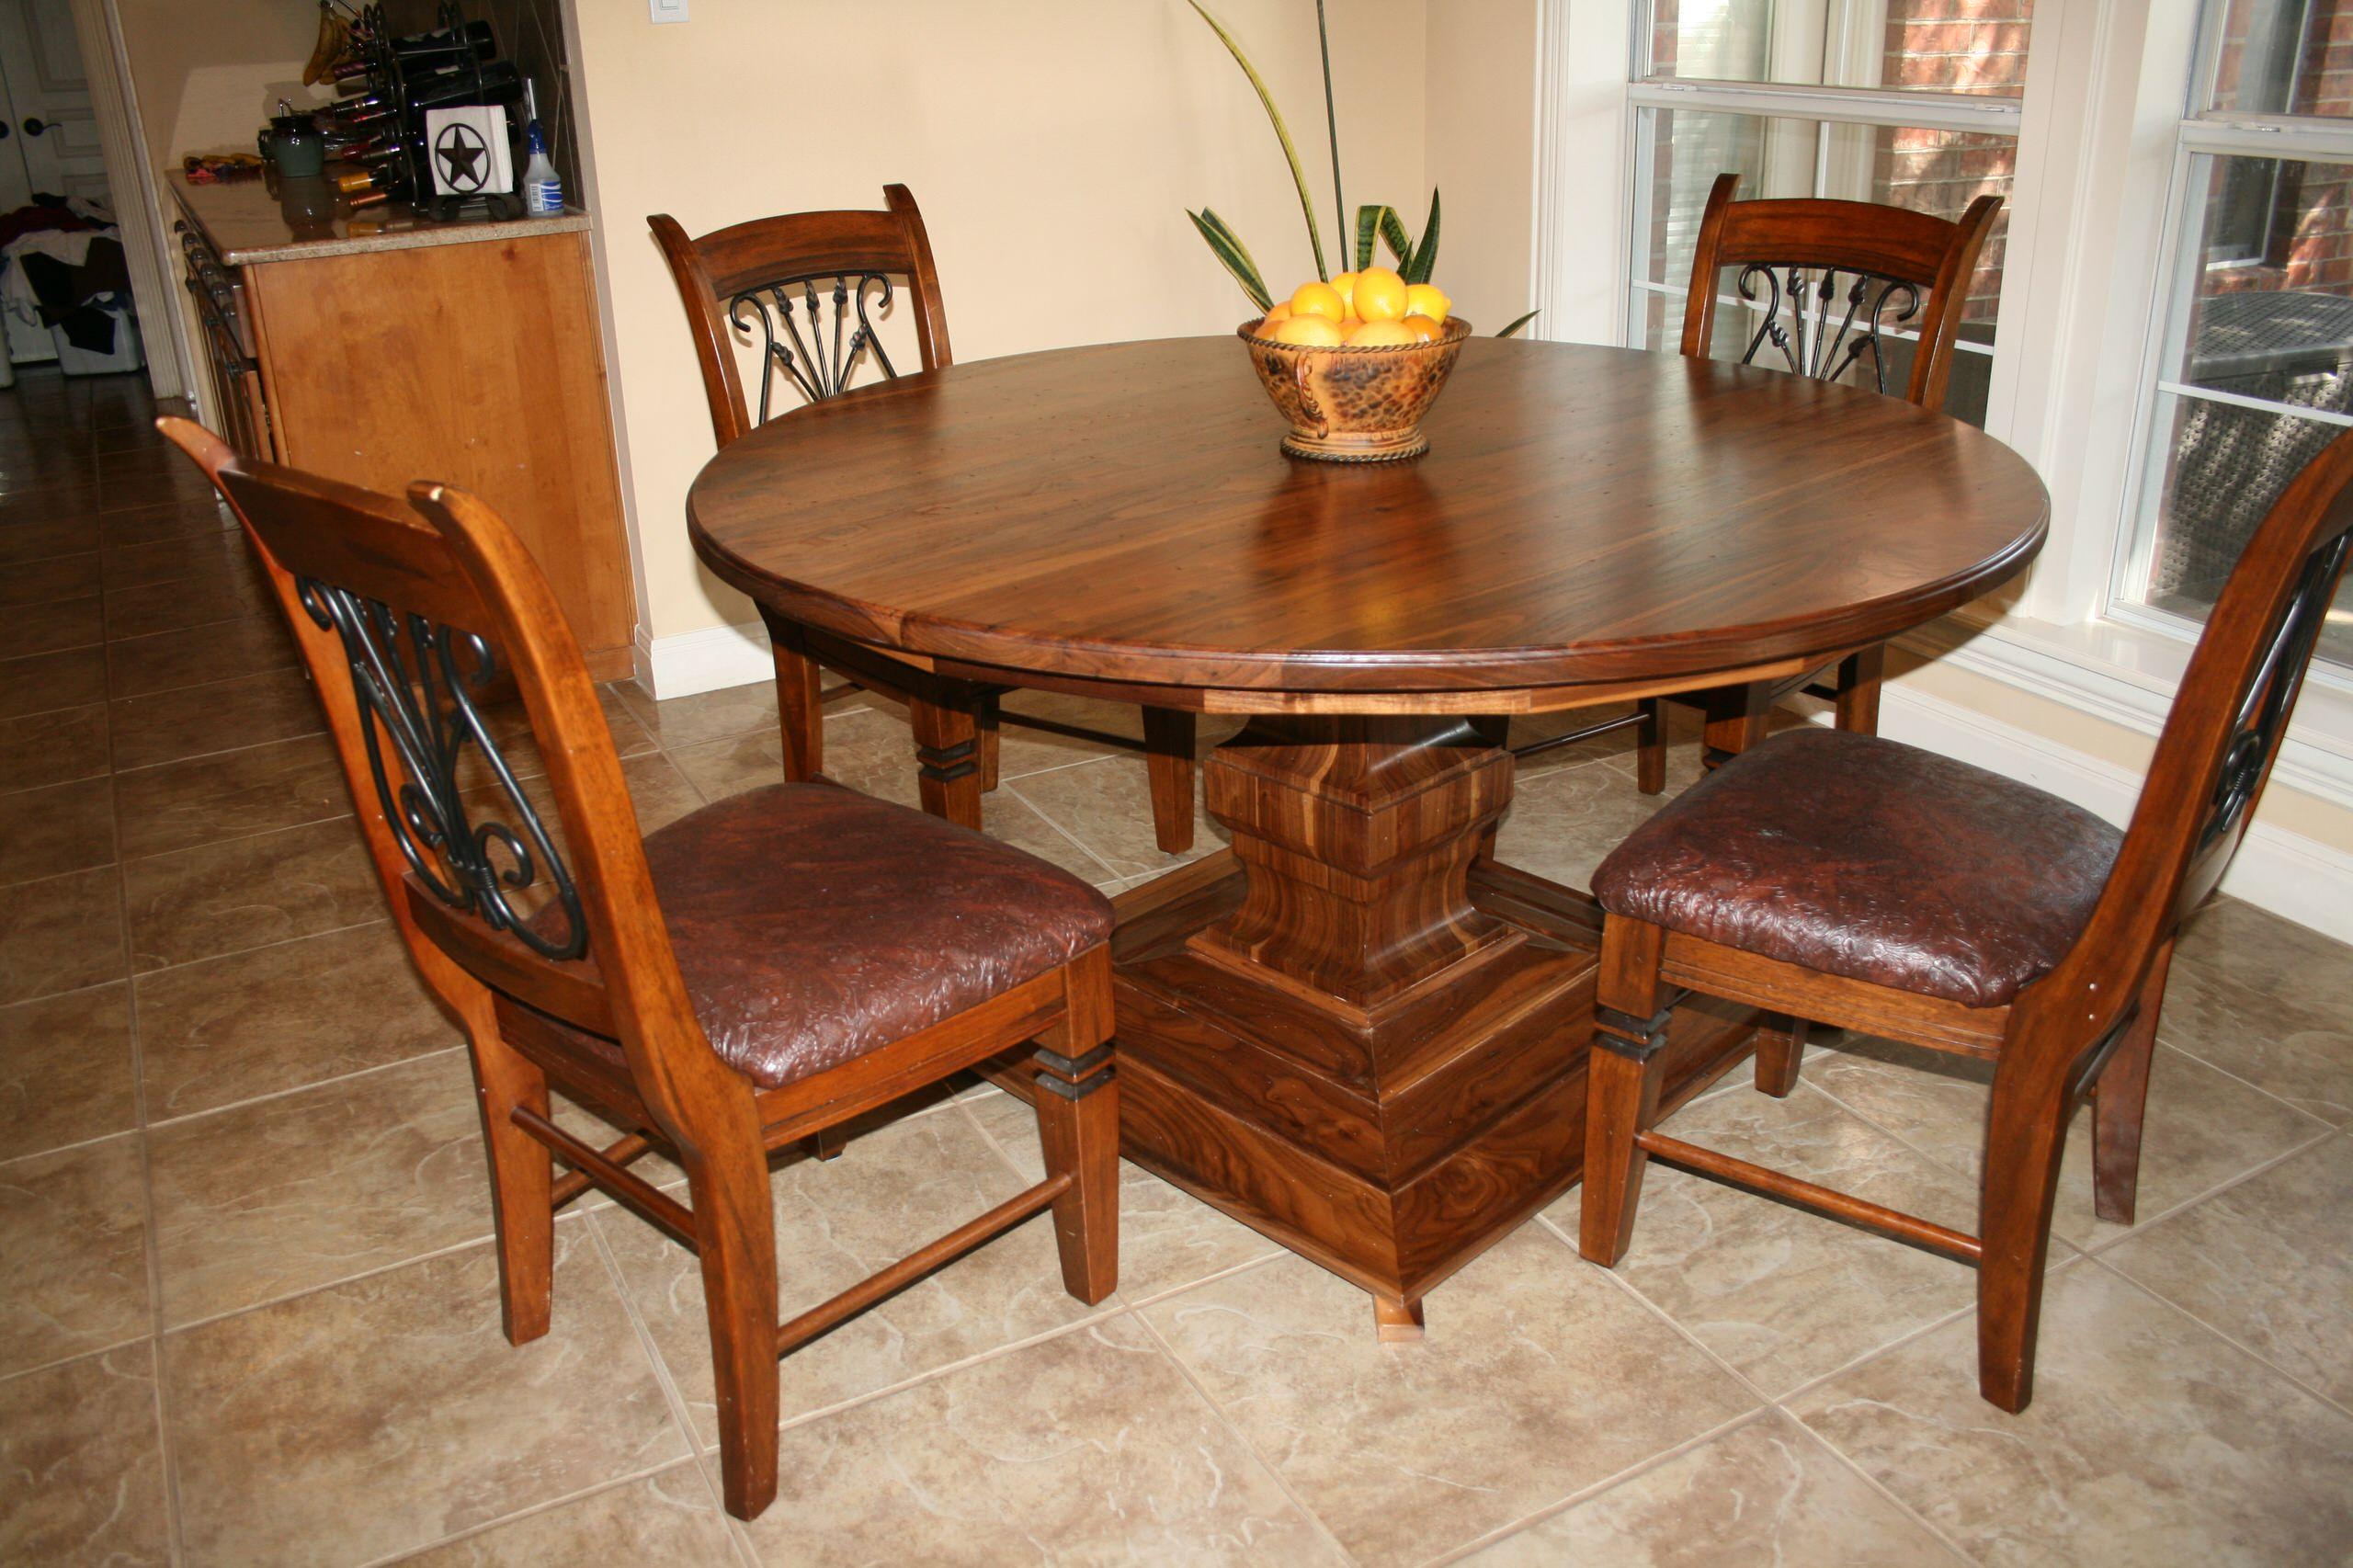 Walnut Round Table with Pedestal